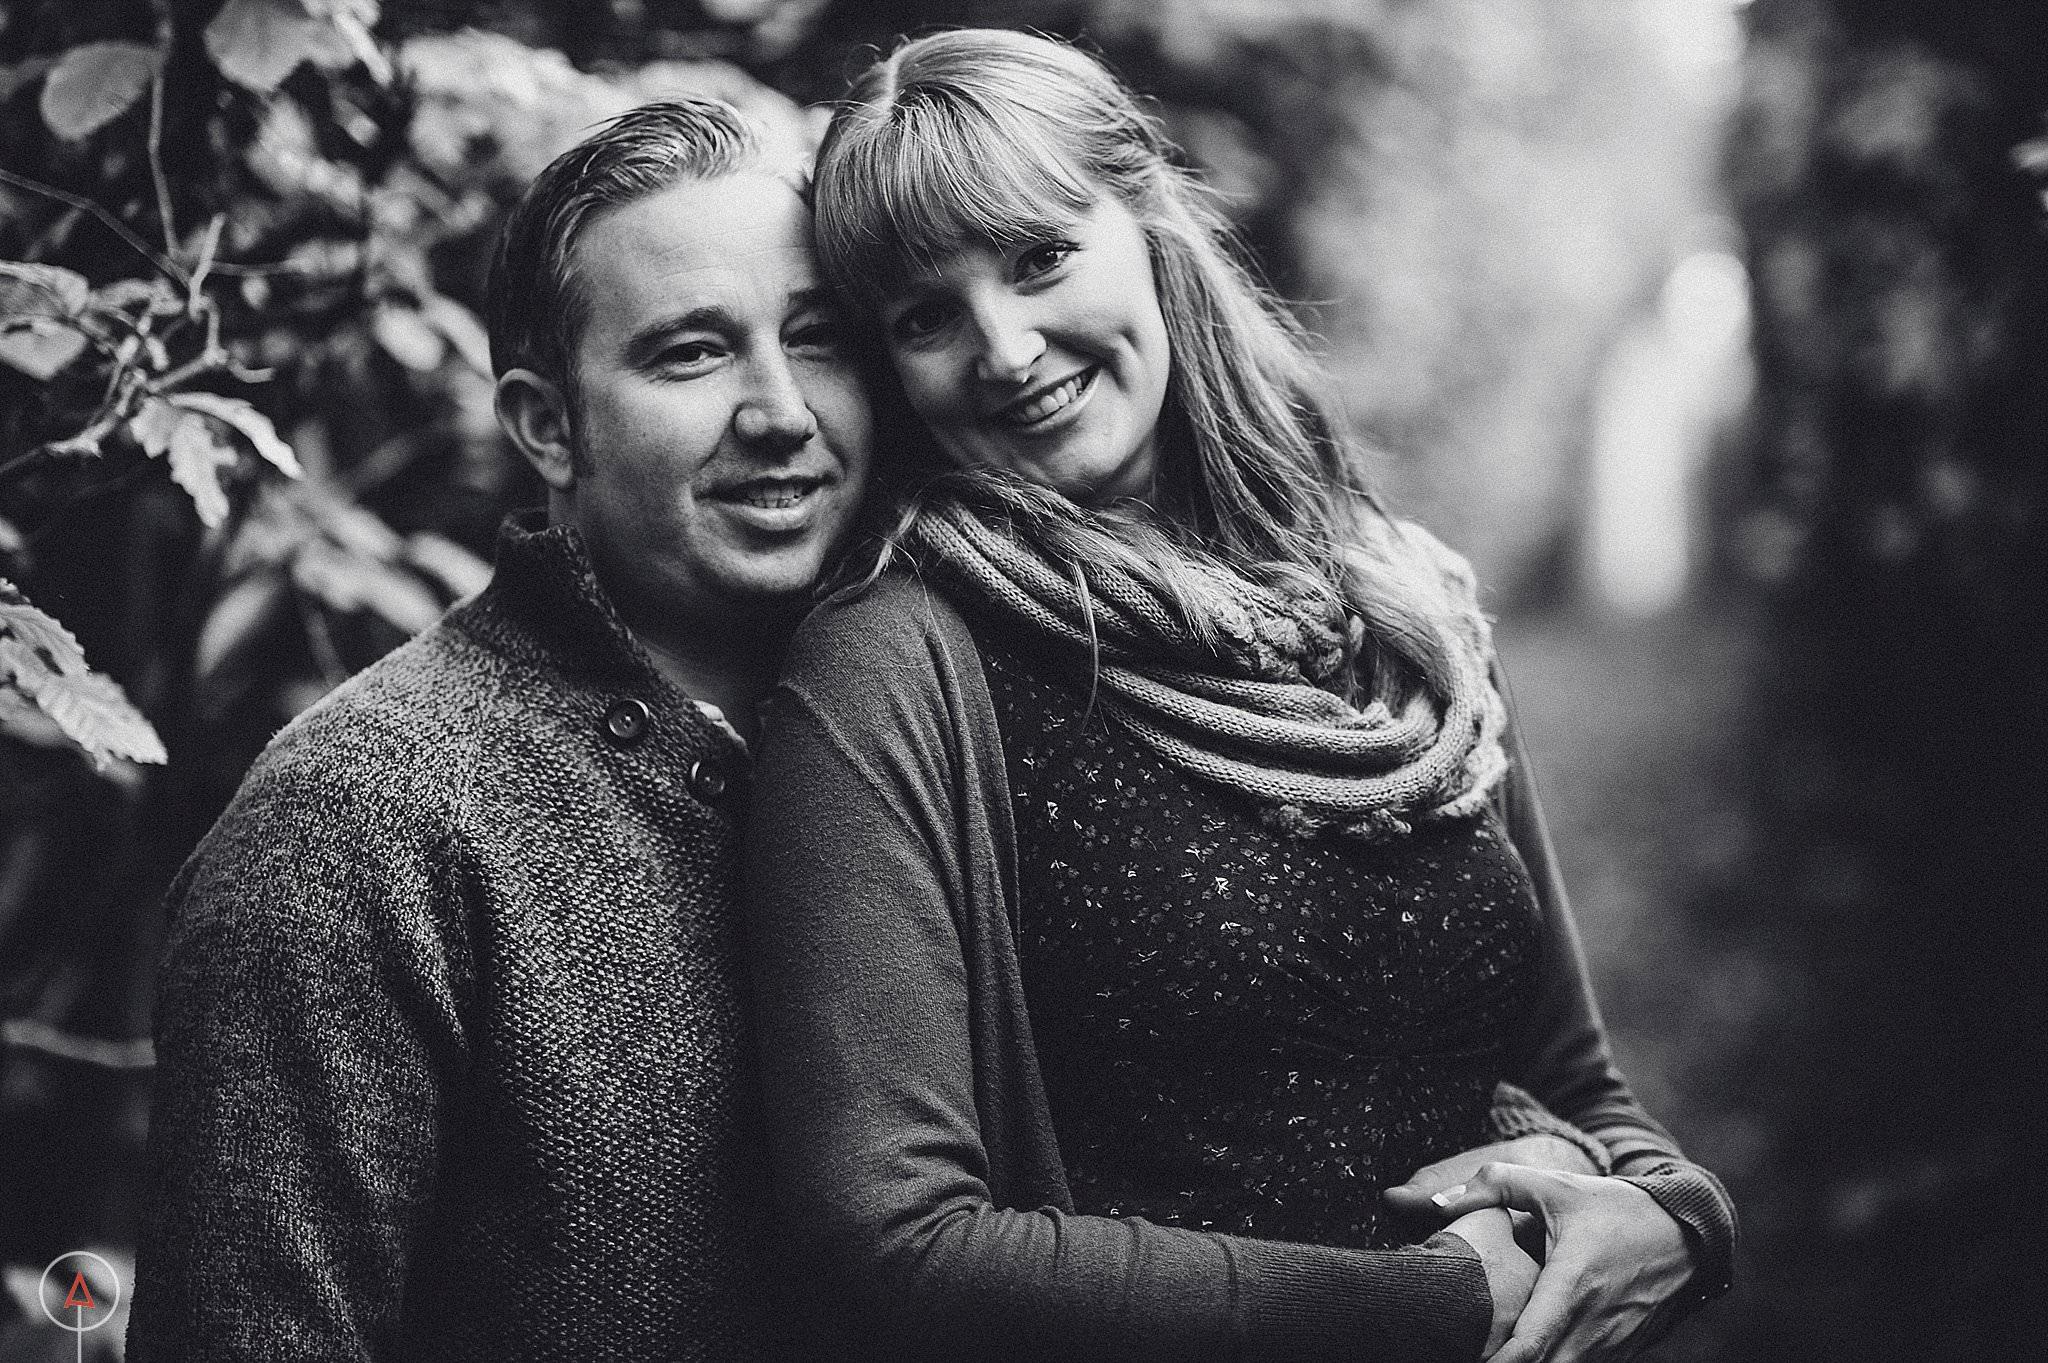 South-Wales-Pre-Wedding-Photography-Aga-Tomaszek-00020